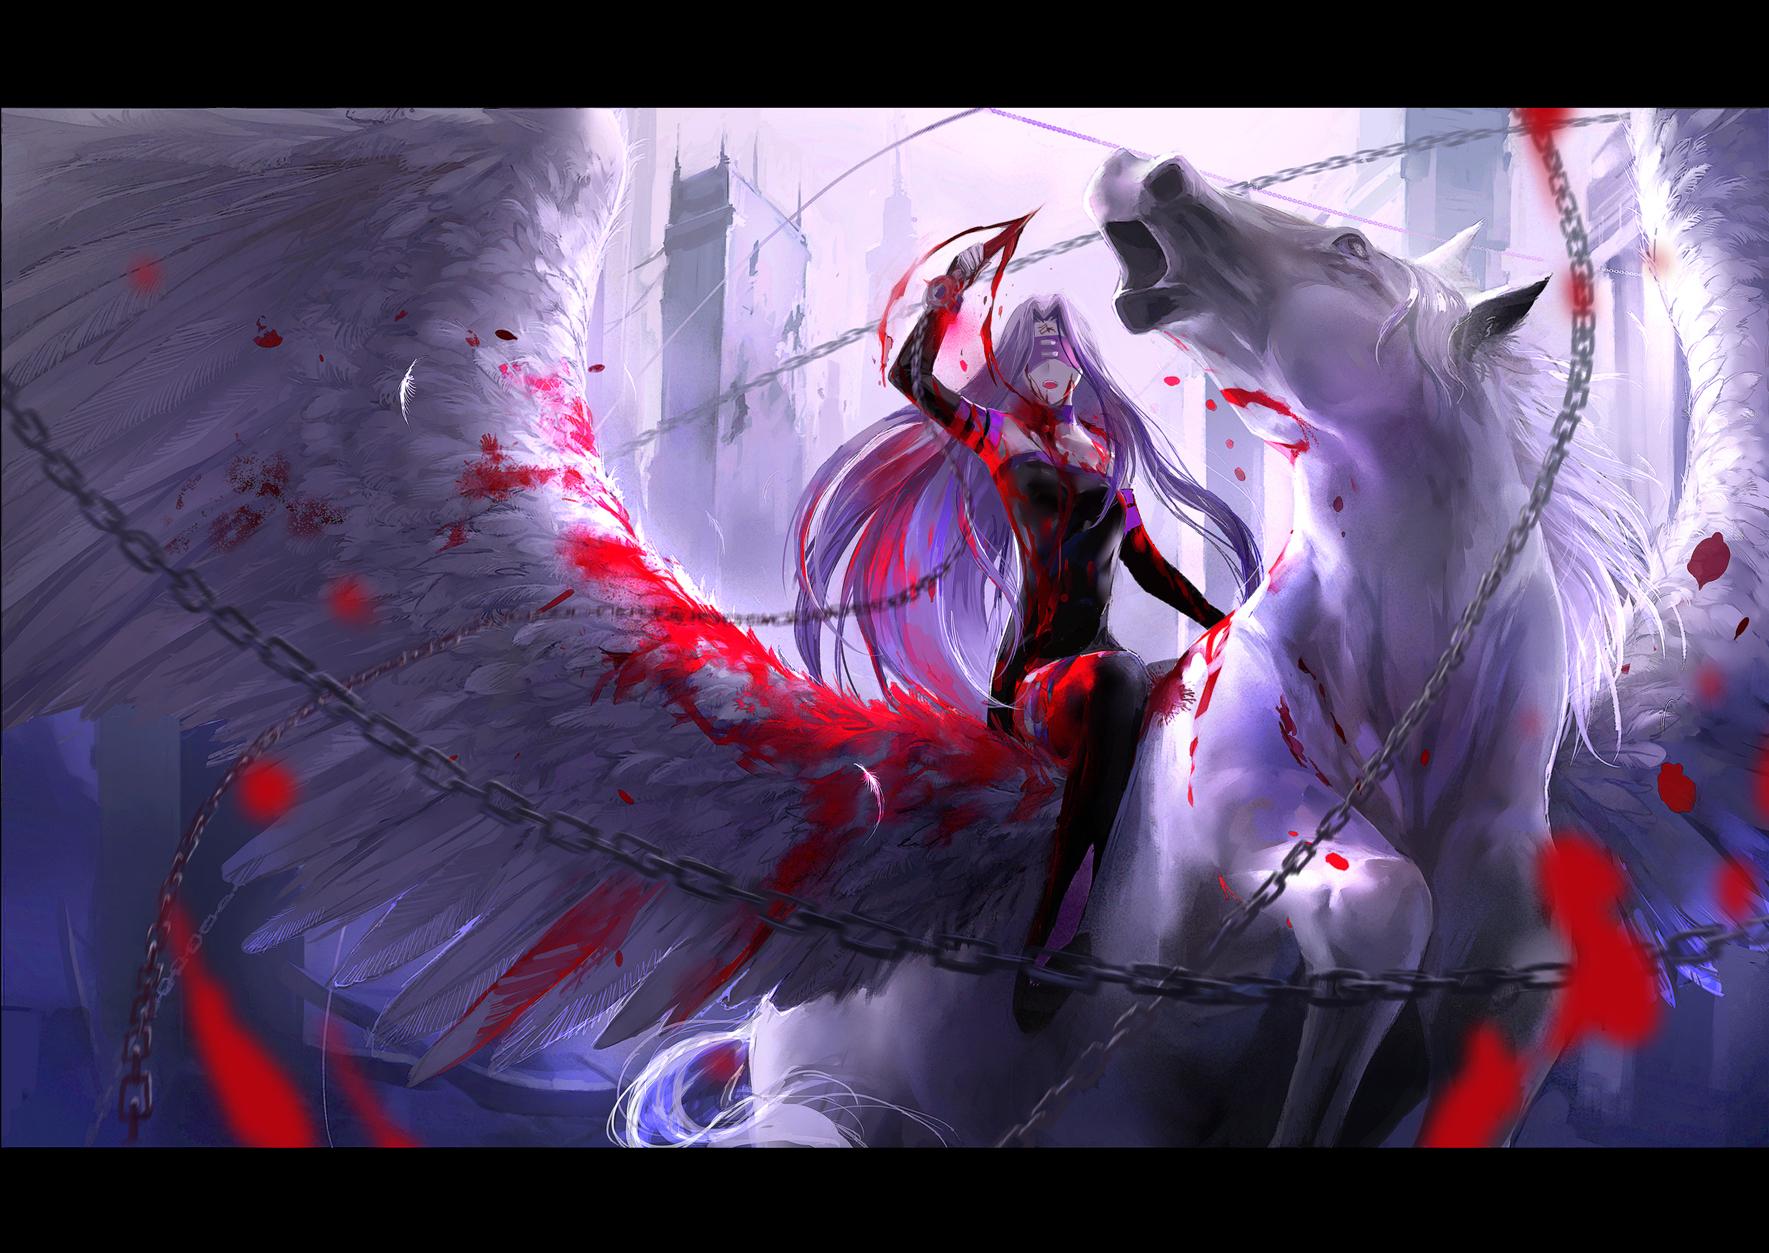 Rider Fate Stay Night Zerochan Anime Image Board